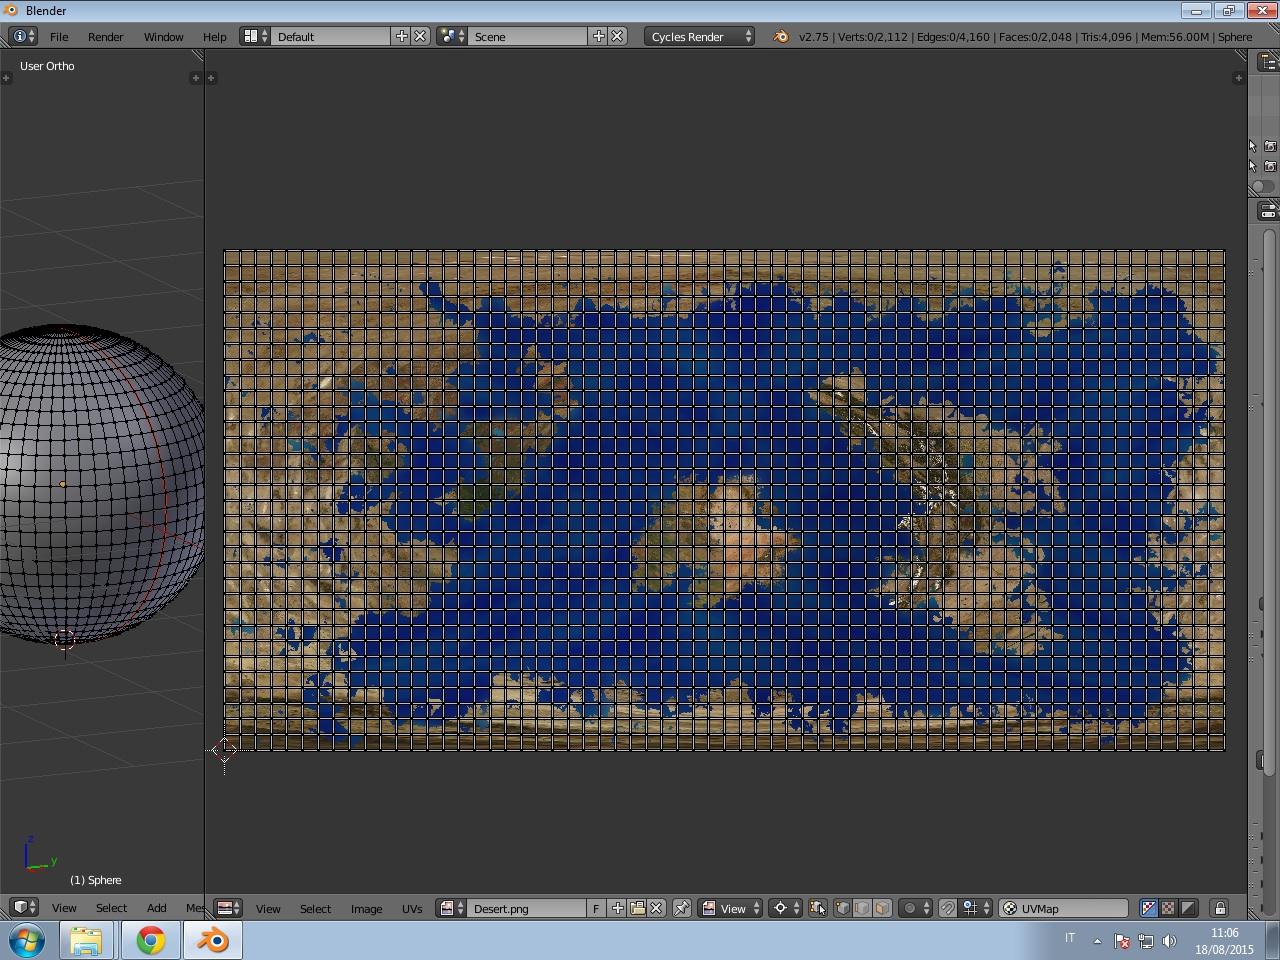 HELP] Planet texture - Materials and Textures - Blender Artists